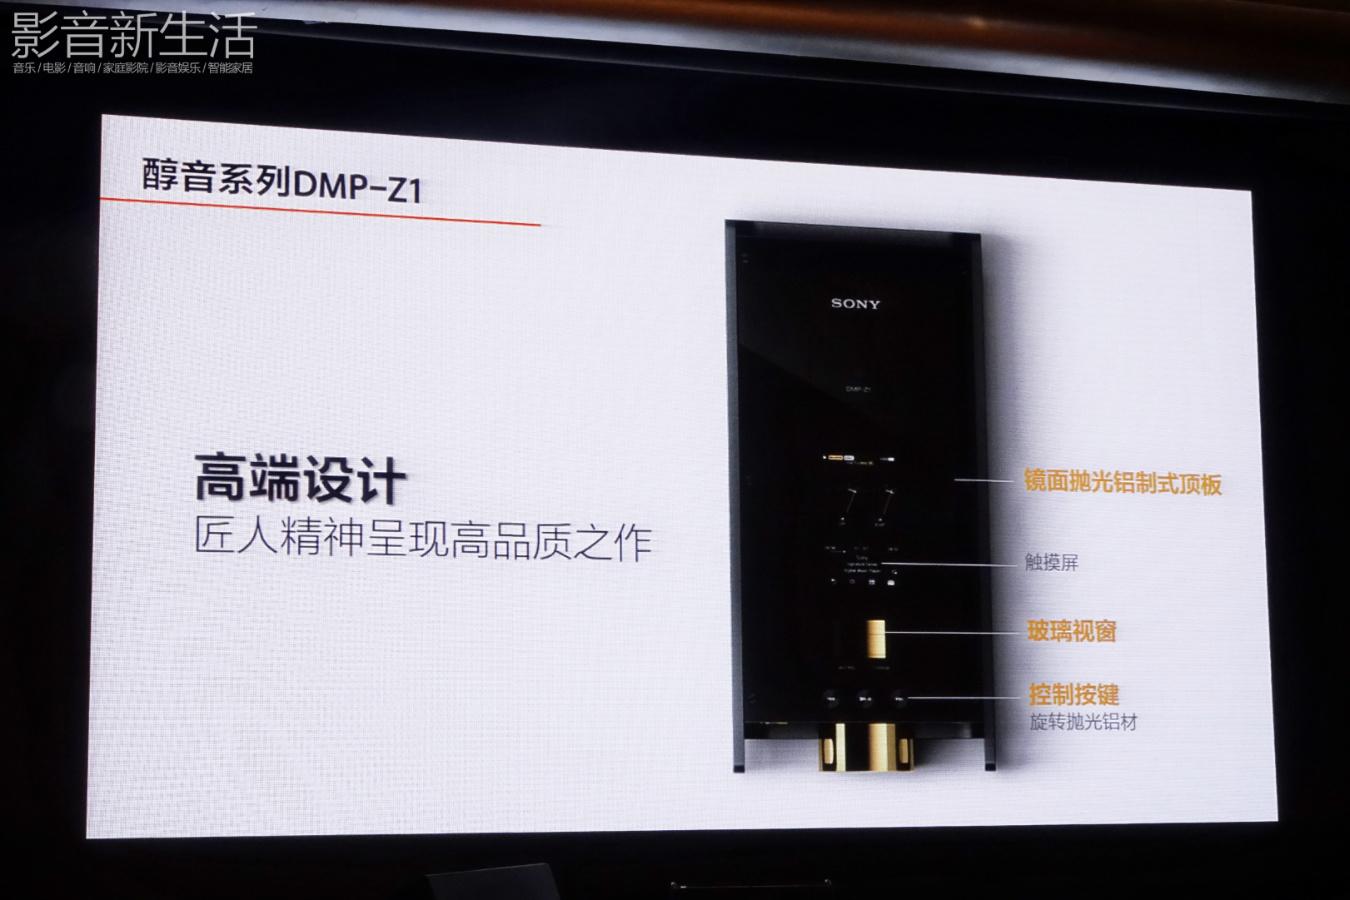 "Sony Hi Res 2018 40 - 新品 | ""重塑随身音乐娱乐王朝!"":Sony索尼发布Signature醇音系列新兄弟IER-Z1R和DMP-Z1,以及舞台监听耳机系列:IER-M7和IER-M9,还有升级款MDR-Z7M2!"